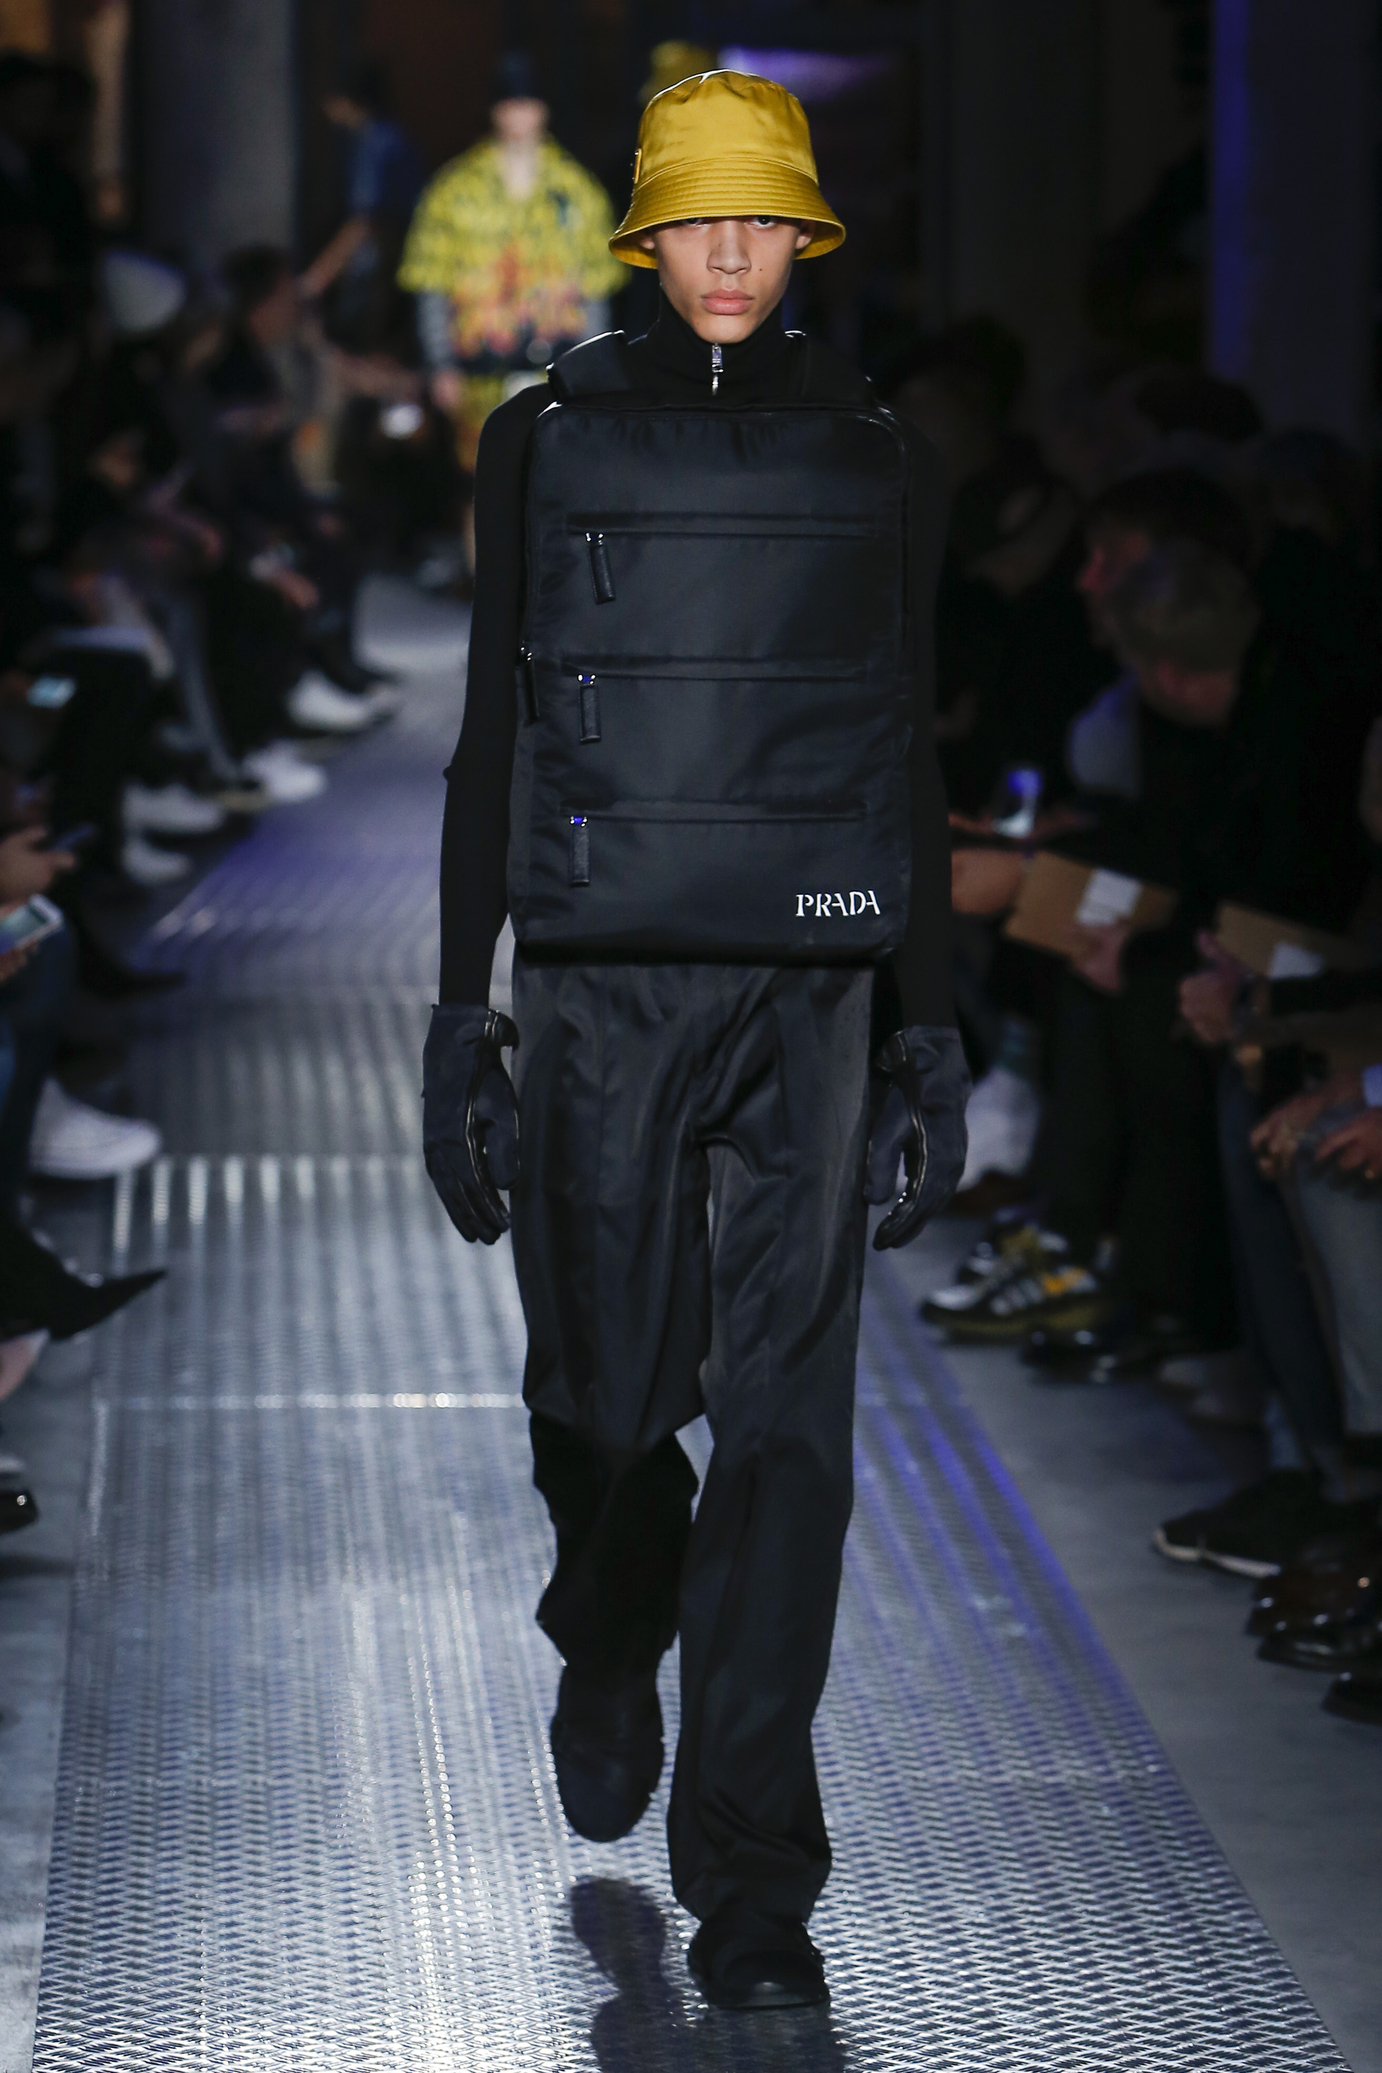 Prada Menswear Fall:Winter 2018 2